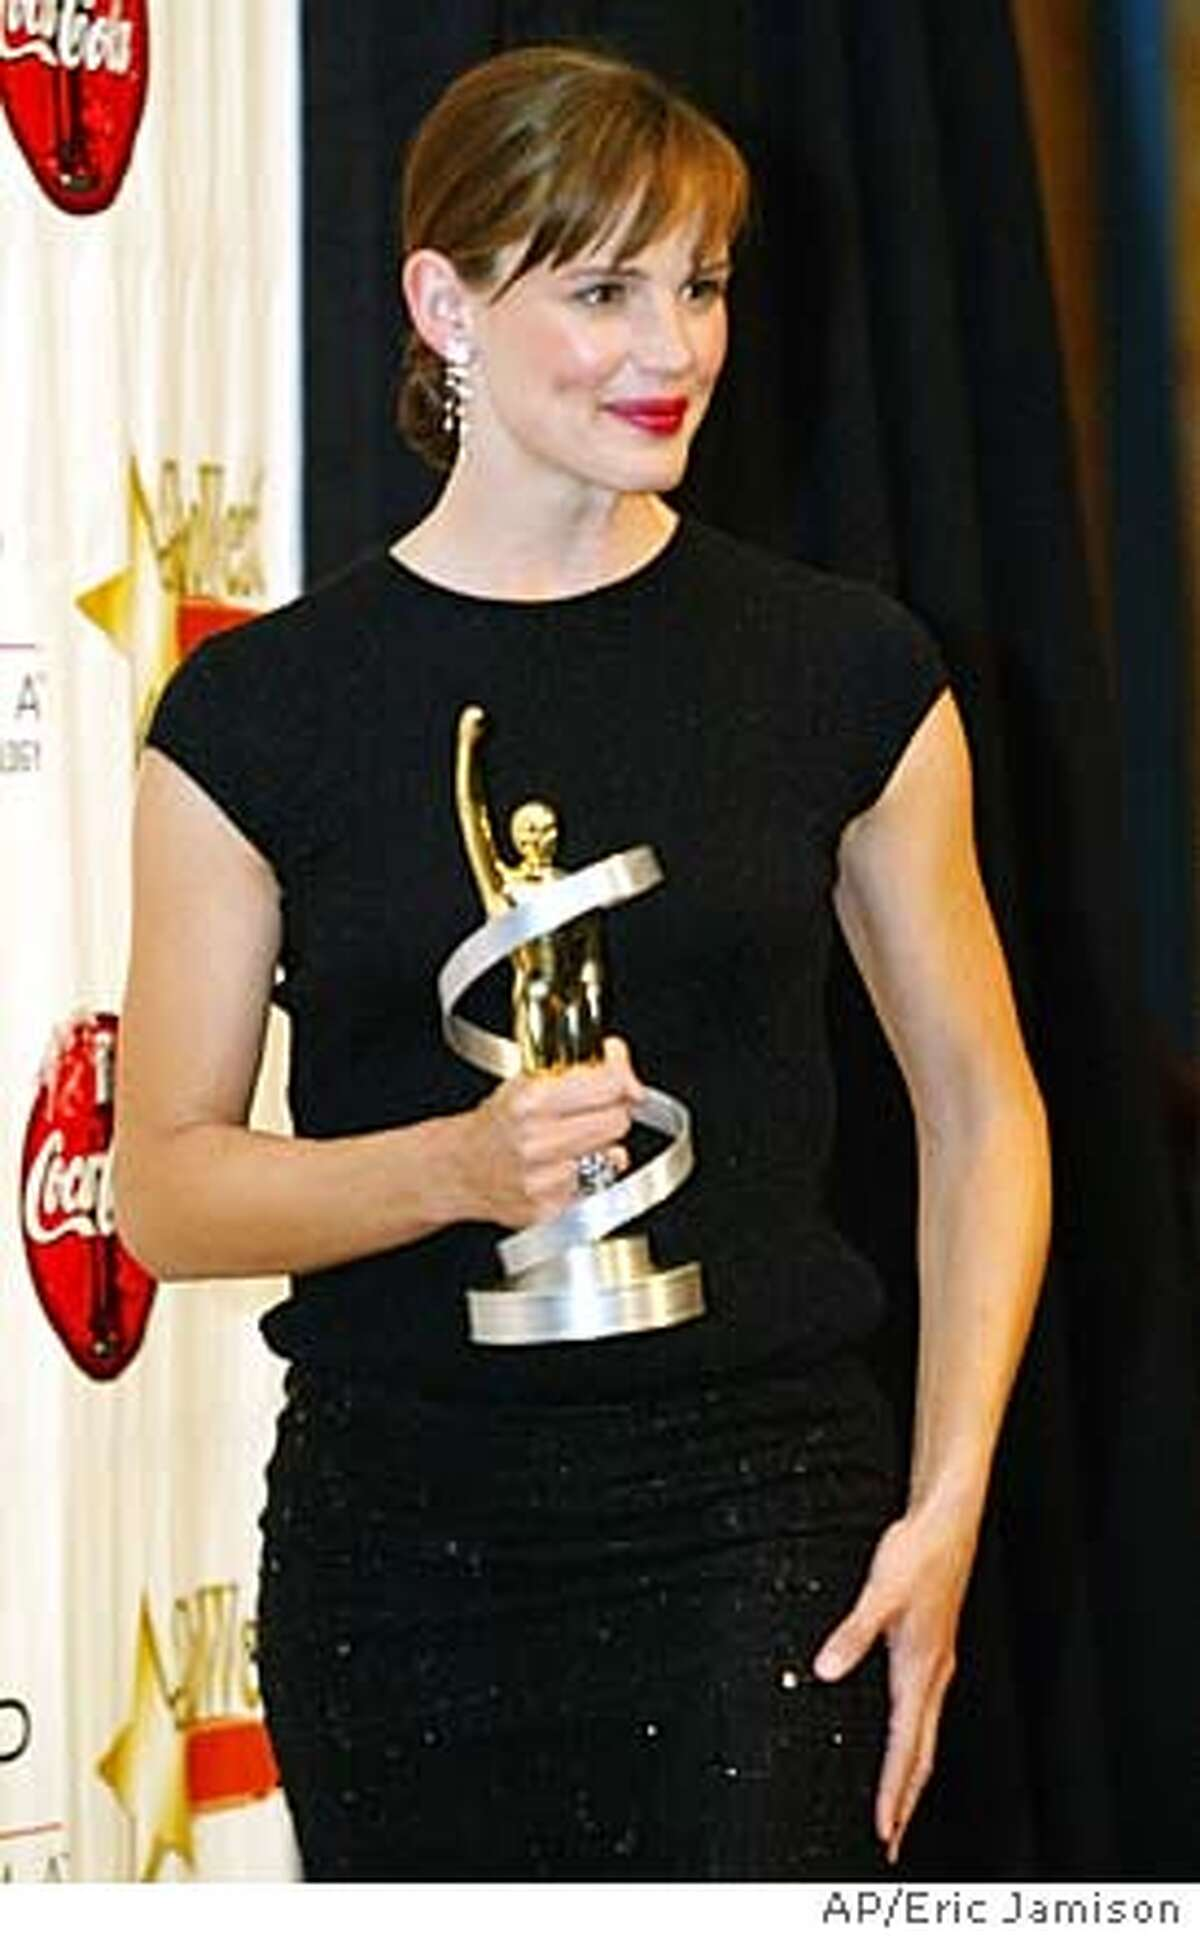 Actress Jennifer Garner poses for photographers during at The Paris Hotel & Casino Thursday, March 25, 2004, in Las Vegas. Garner won the Female Star of Tomorrow award. (AP Photo/Eric Jamison)